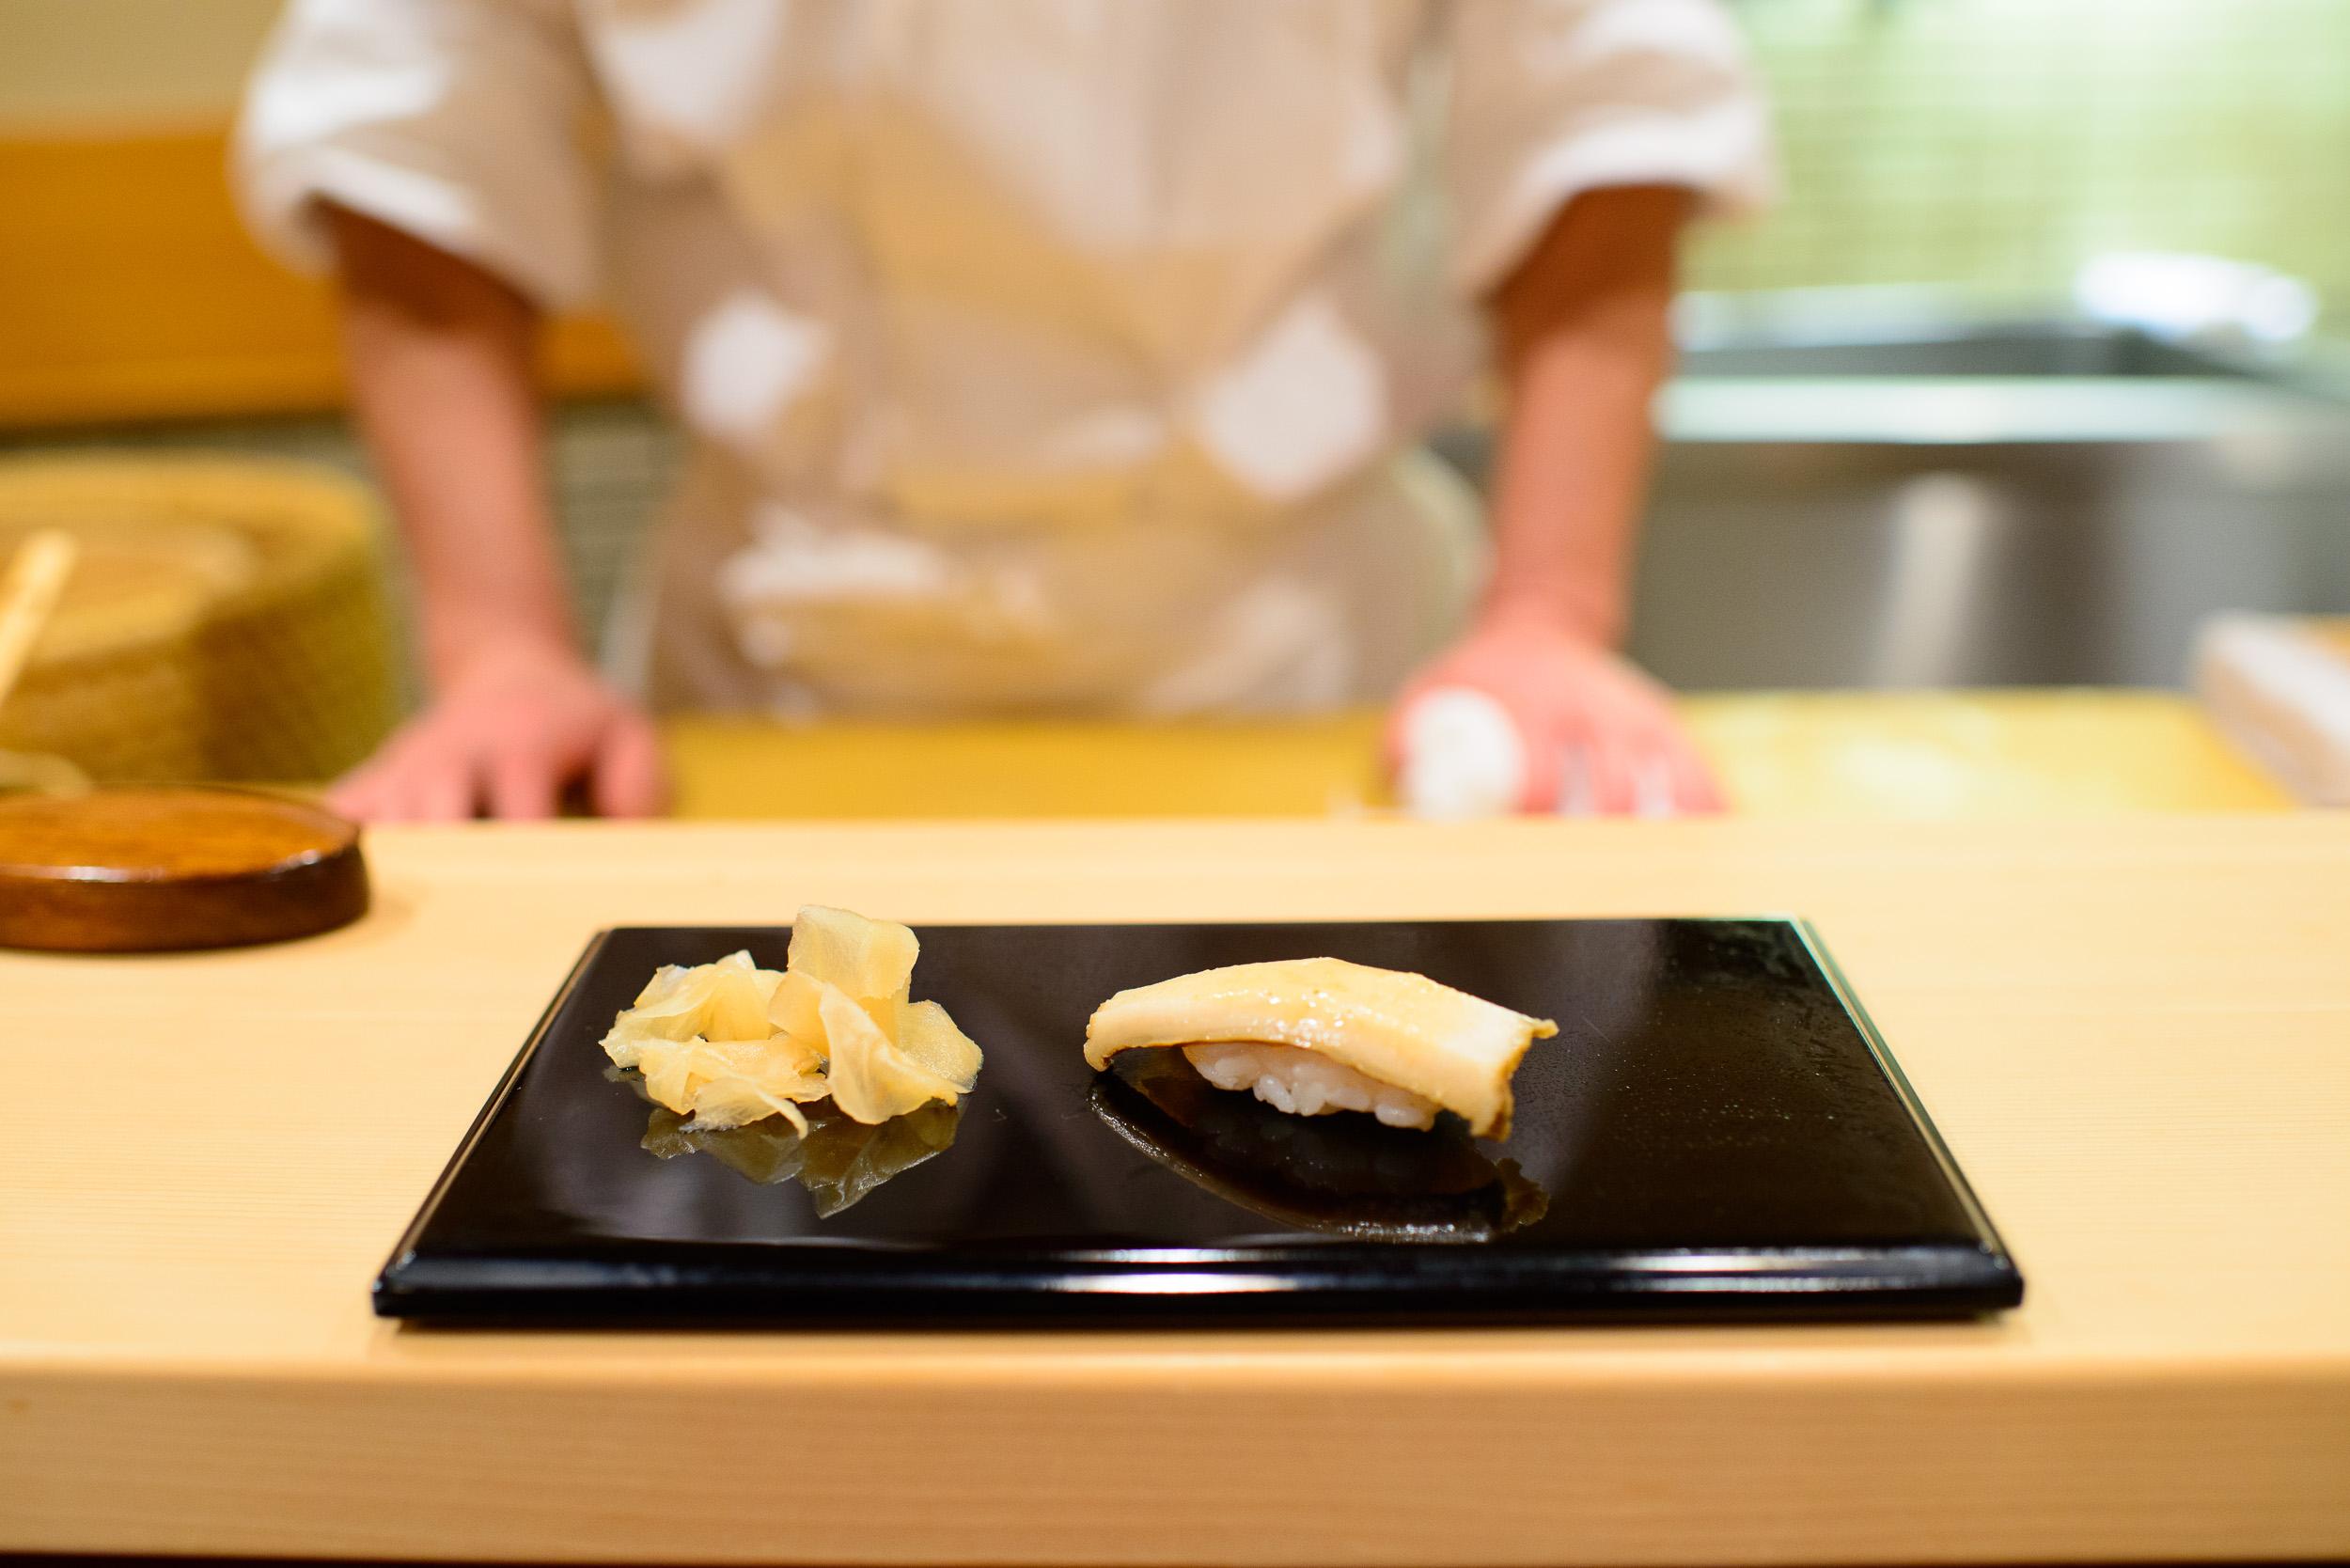 8th Course: Mushi-awabi